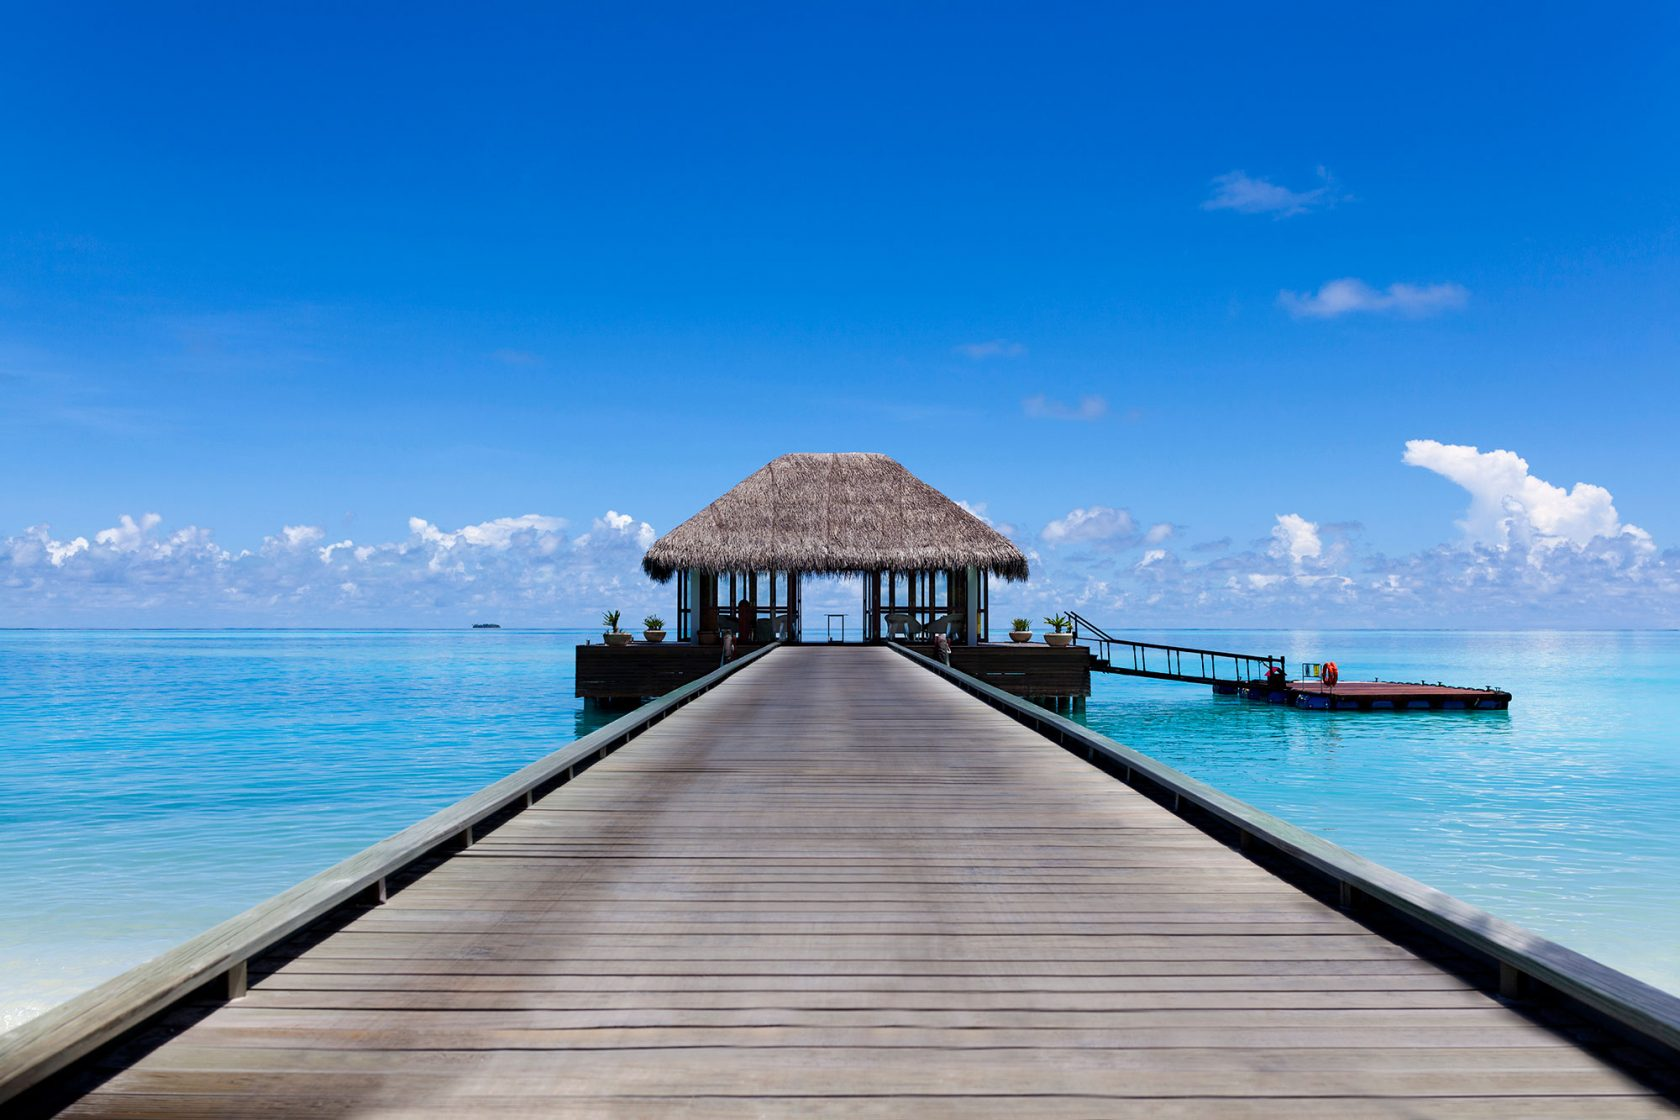 Niyama Island Resort Maldives Arrival Jetty